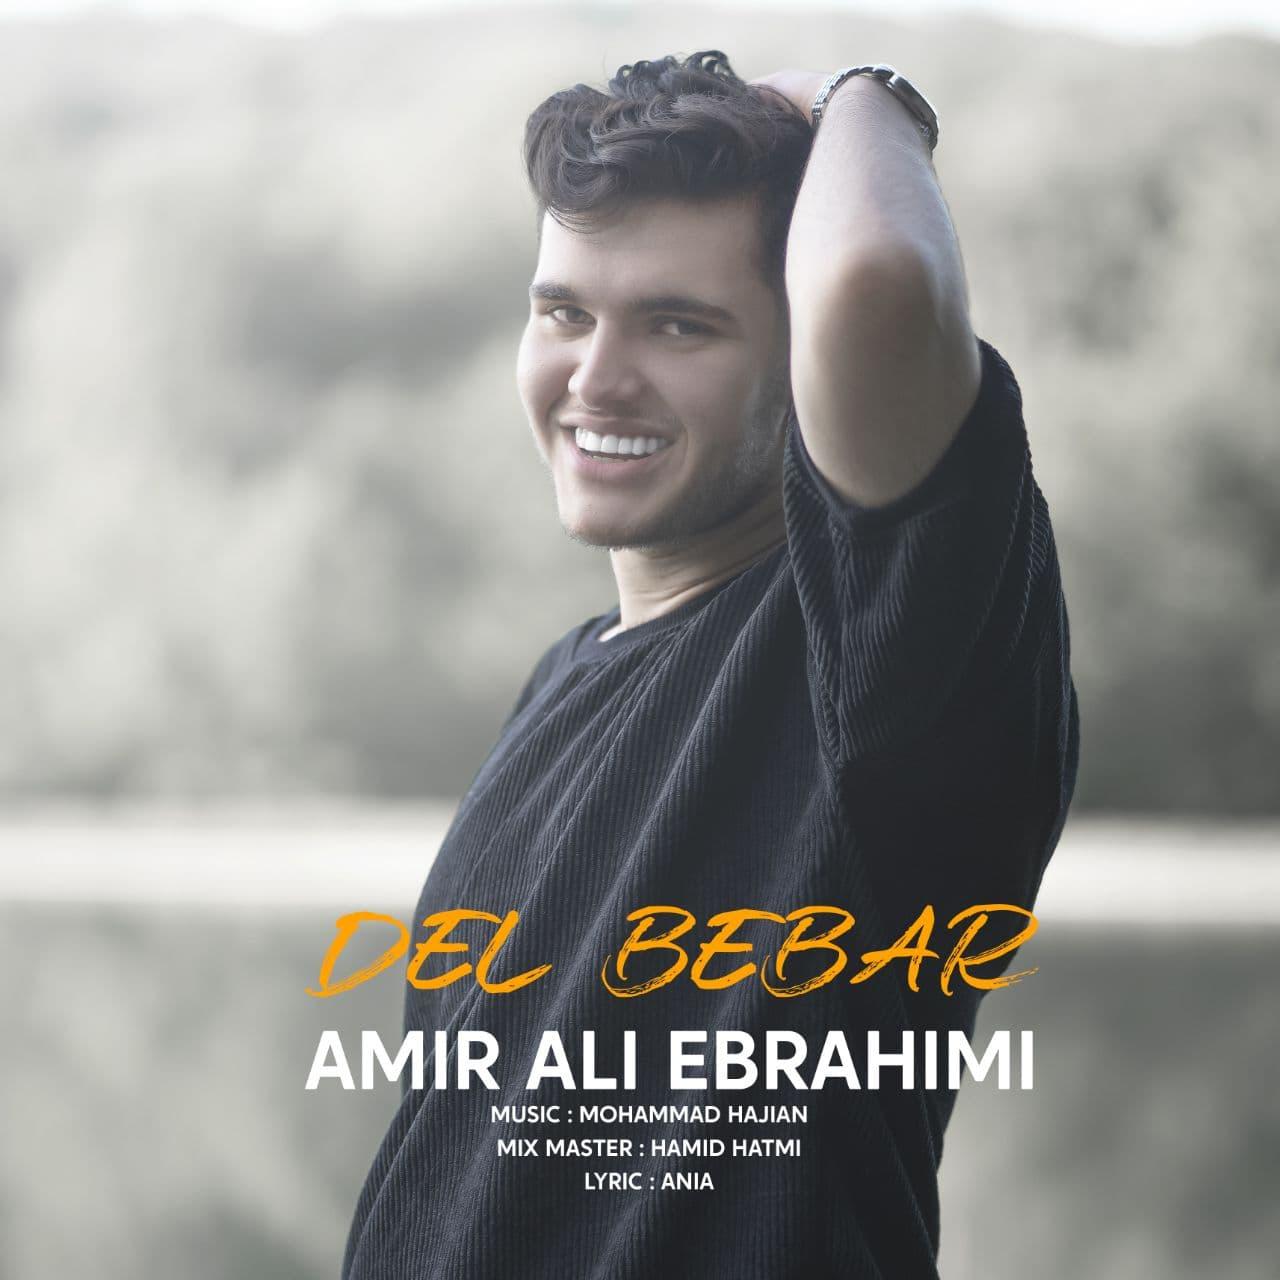 amir ali ebrahimi del bebar دانلود اهنگ دل ببر امیر علی ابراهیمی